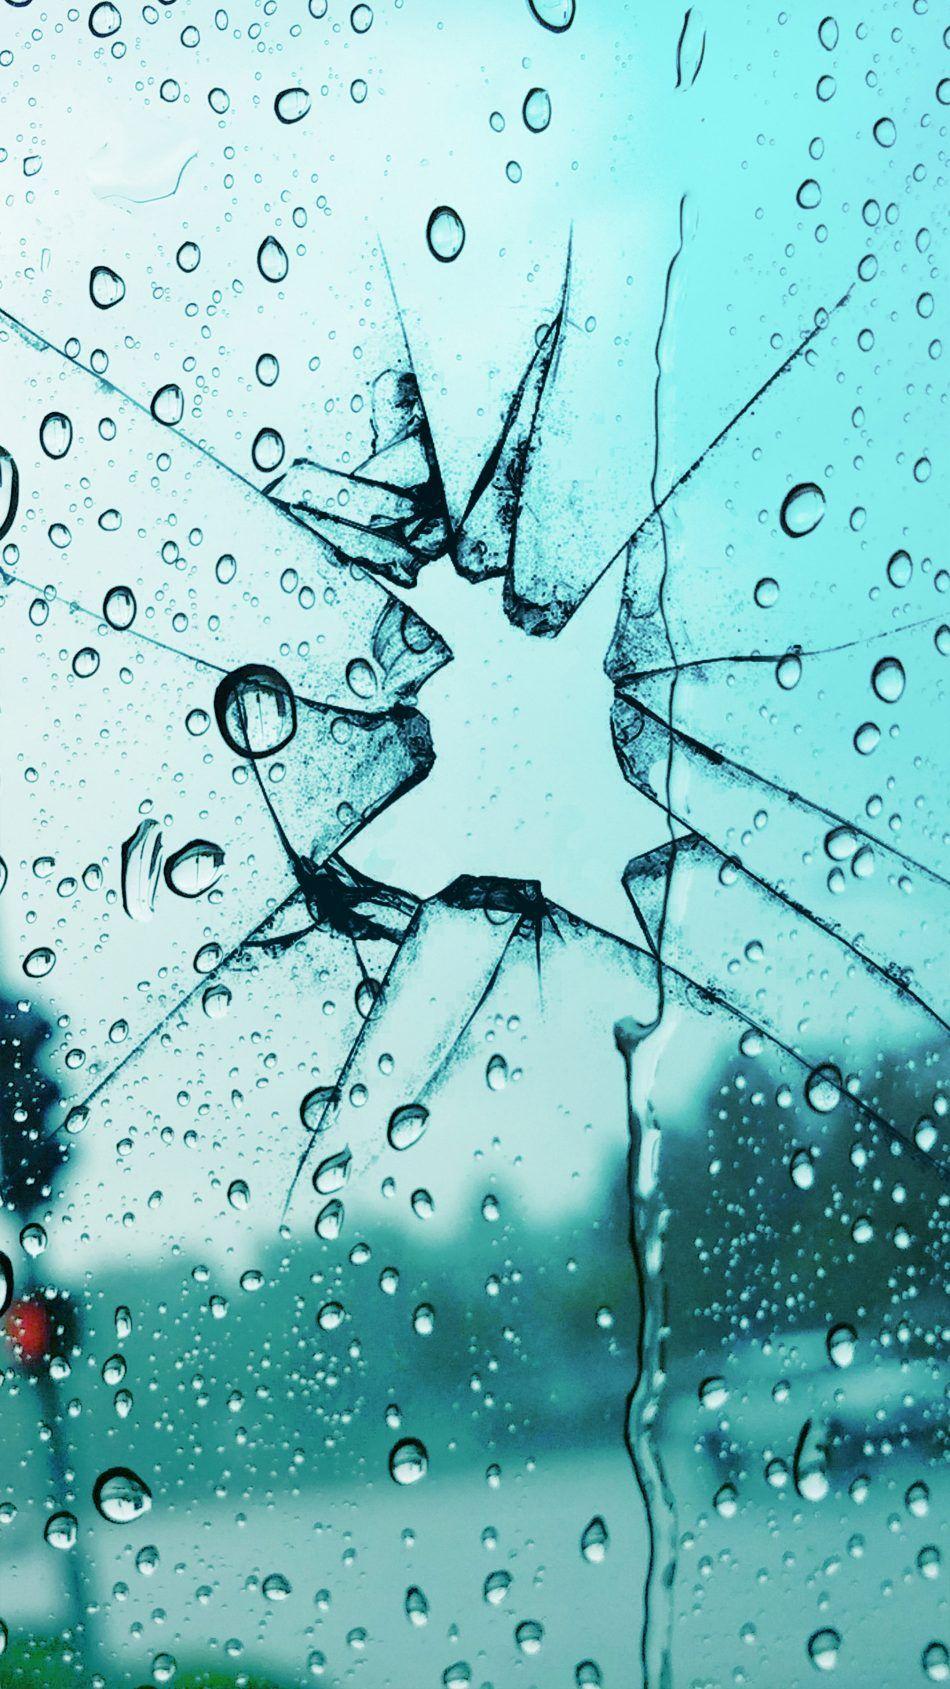 Broken Glass Rain Drops Broken Glass Wallpaper Broken Screen